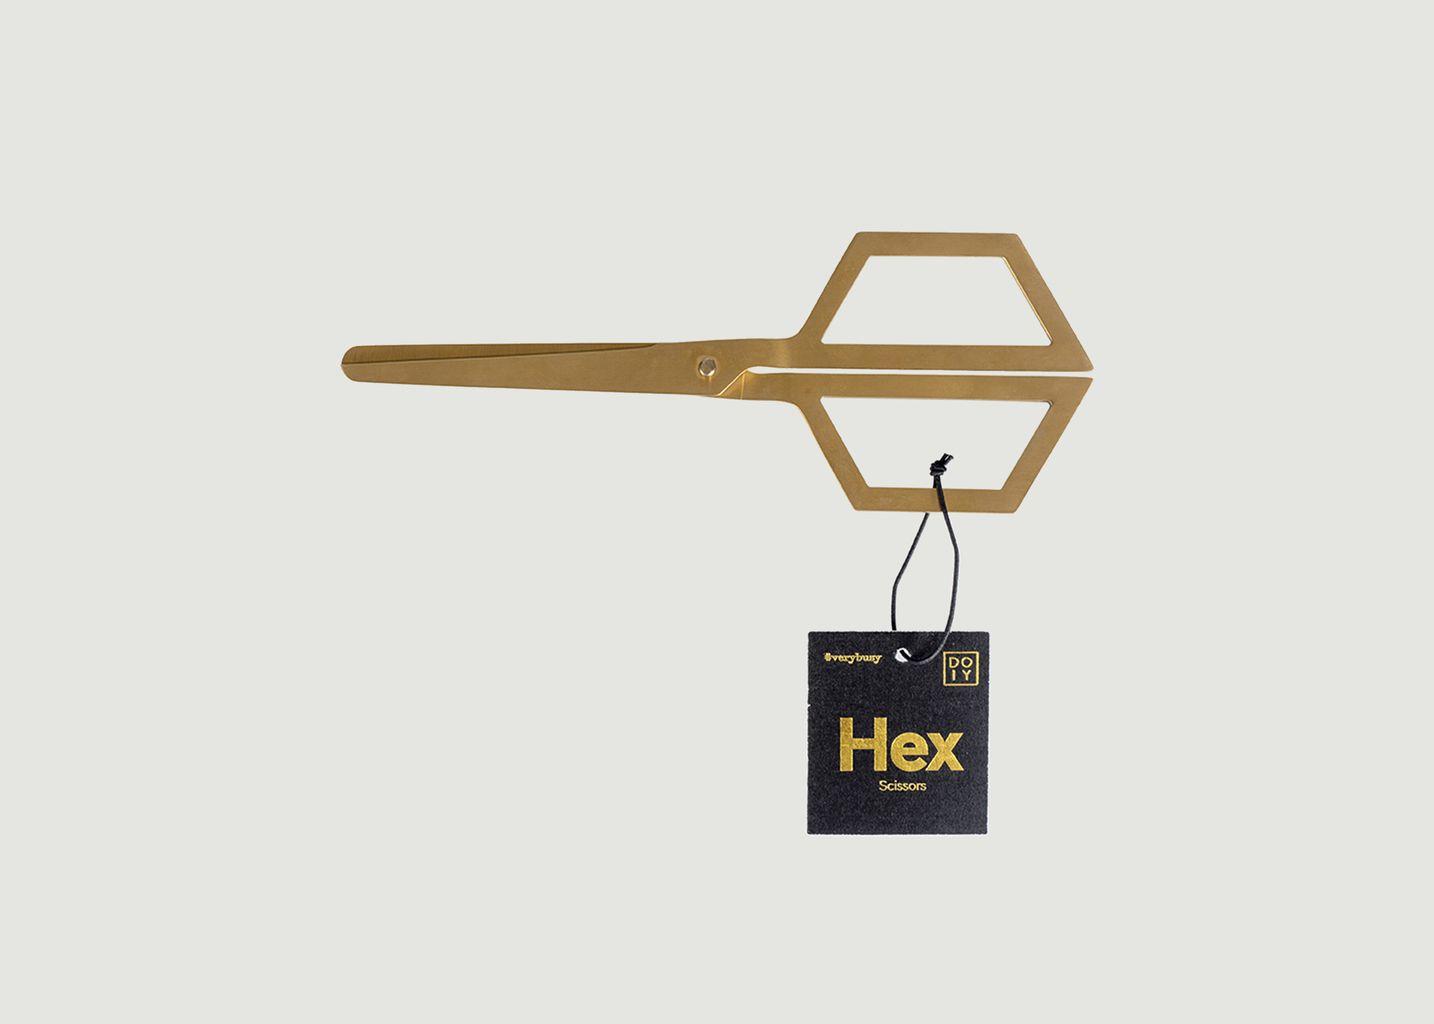 Hex Scissors - Doiy